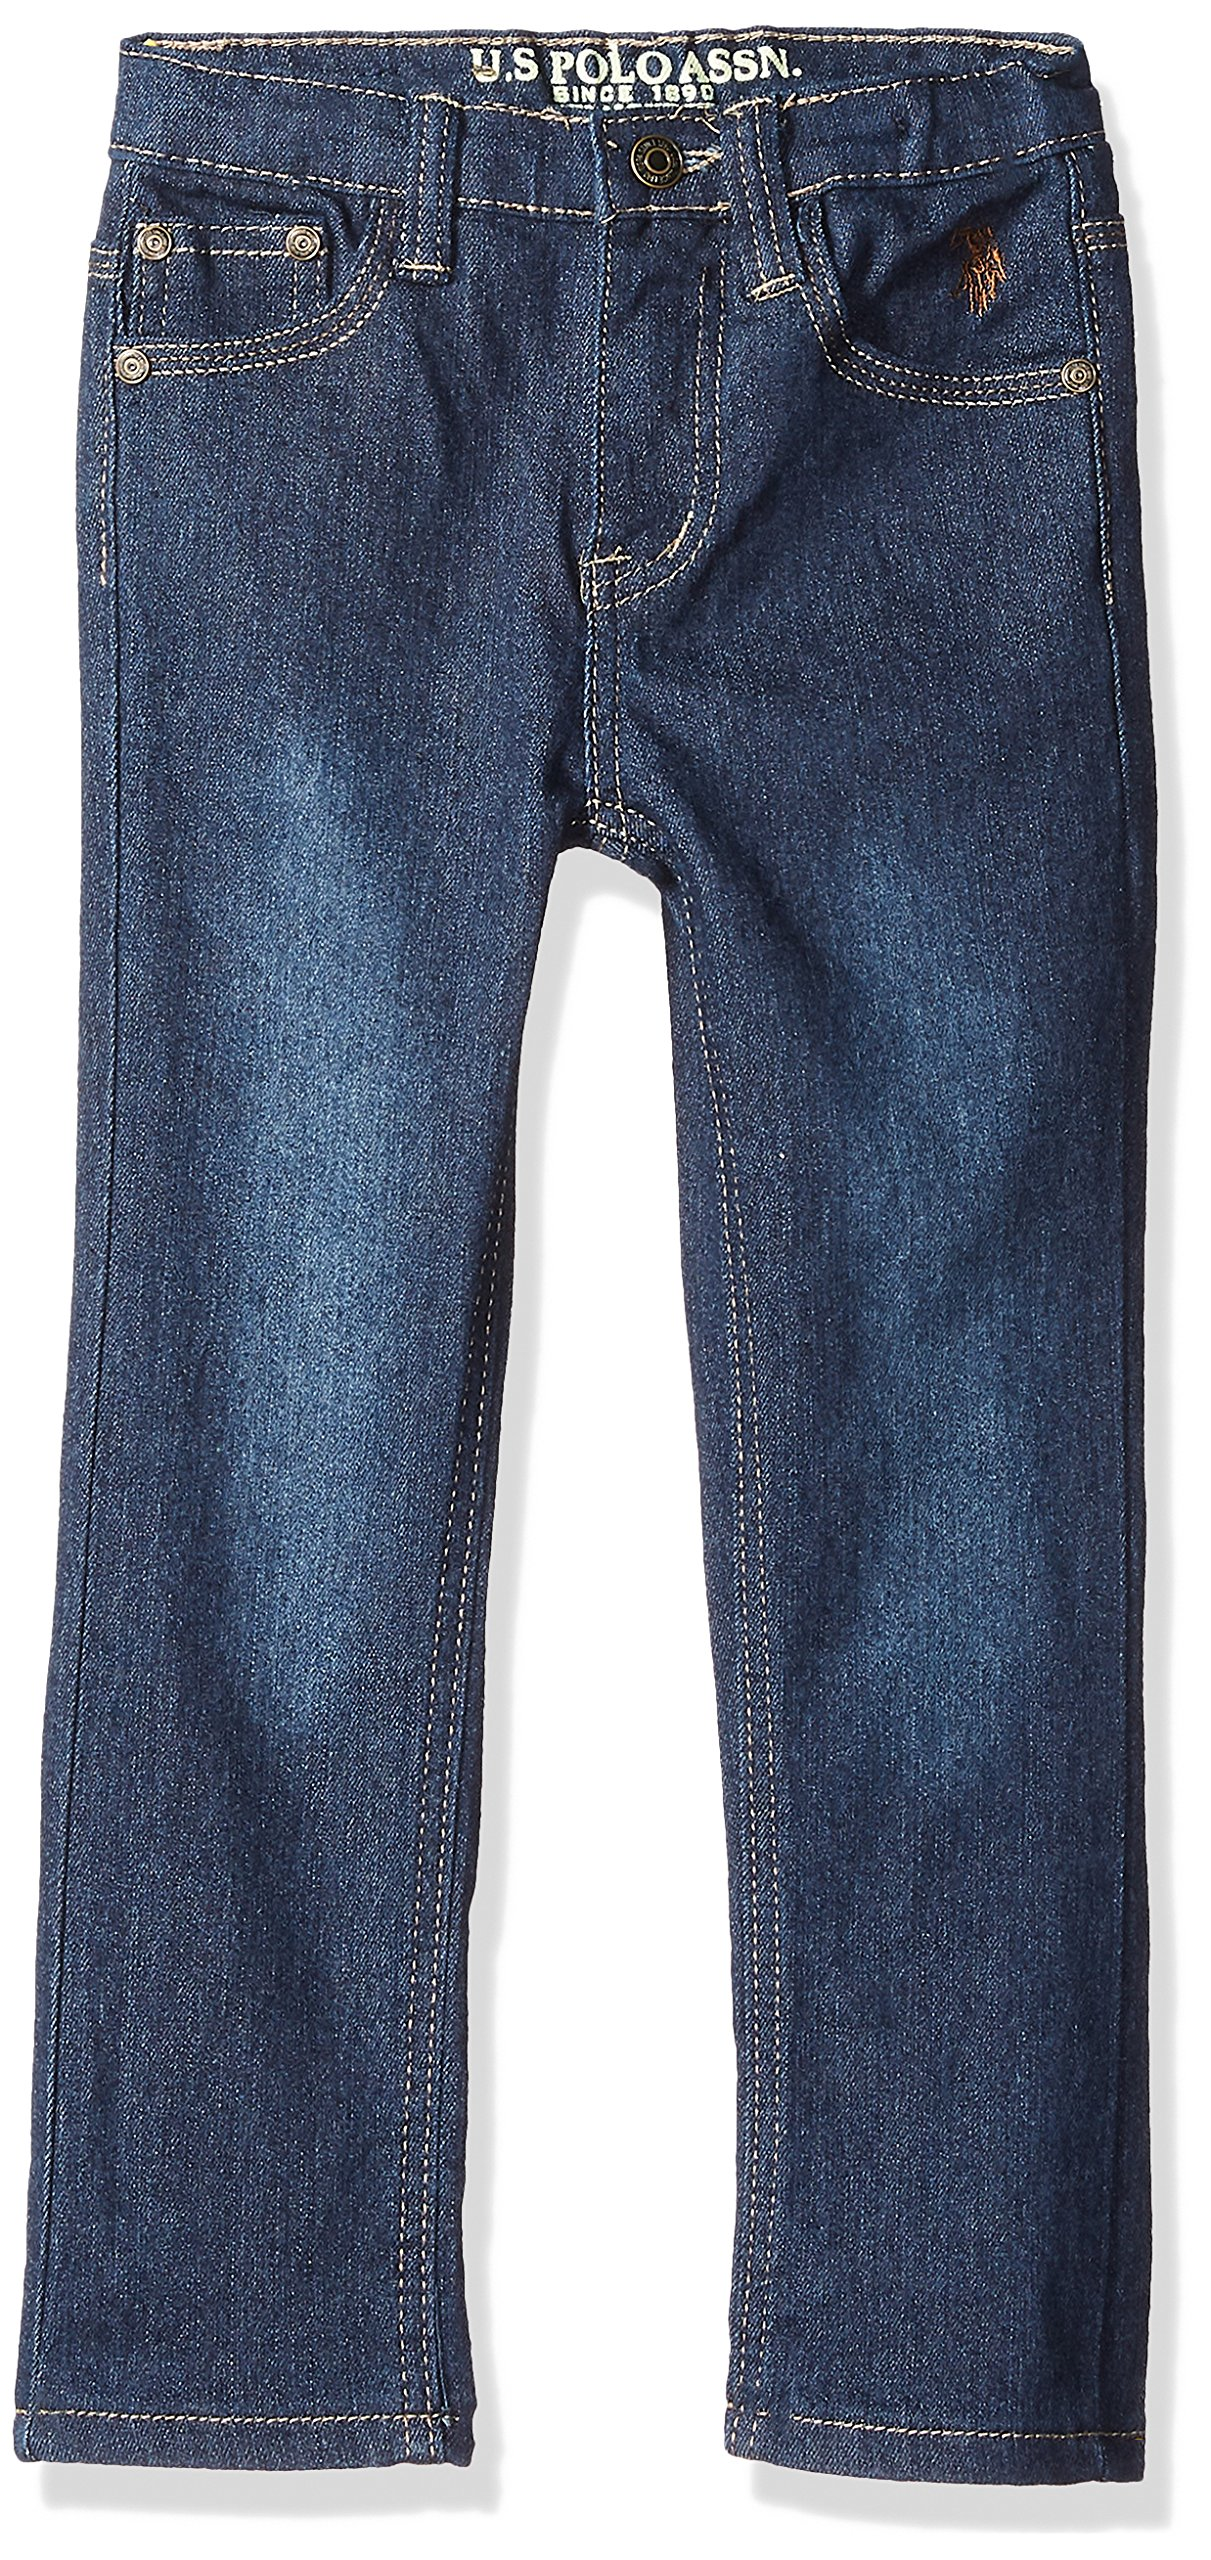 U.S. Polo Assn.. Big Boys' Skinny Jean, Flex Spandex Denim Washed Indigo, 10